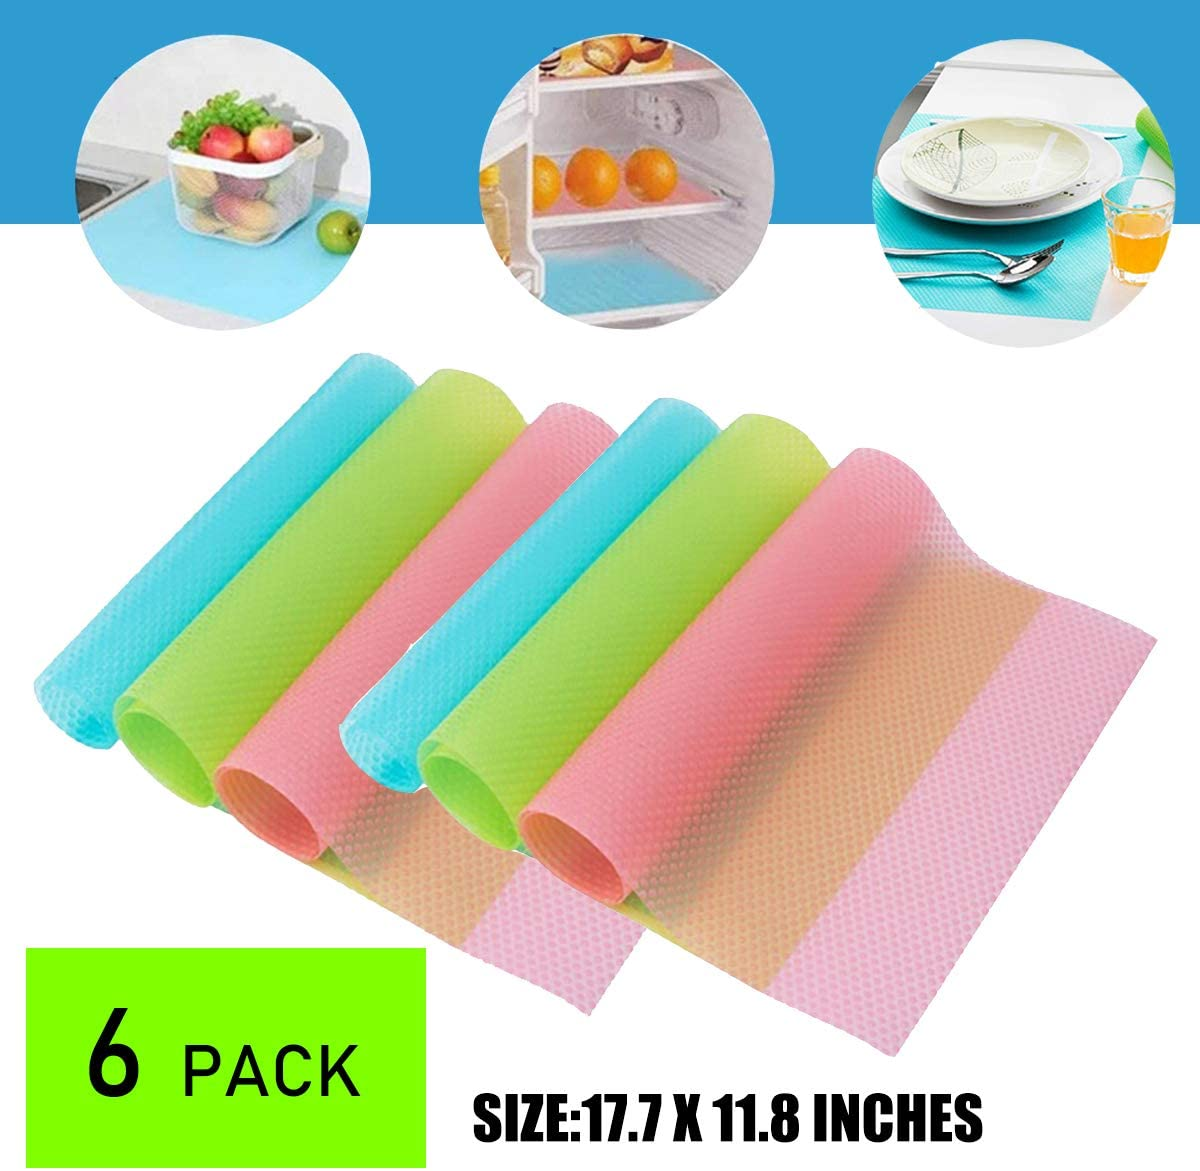 OJYUDD 6 PCS Refrigerator Mats EVA Shelf Liners Refrigerator Liners Can Be Cut Refrigerator Mats Pad Washable Fridge Mats Liners 2 Pink/2 Green/2 Blue